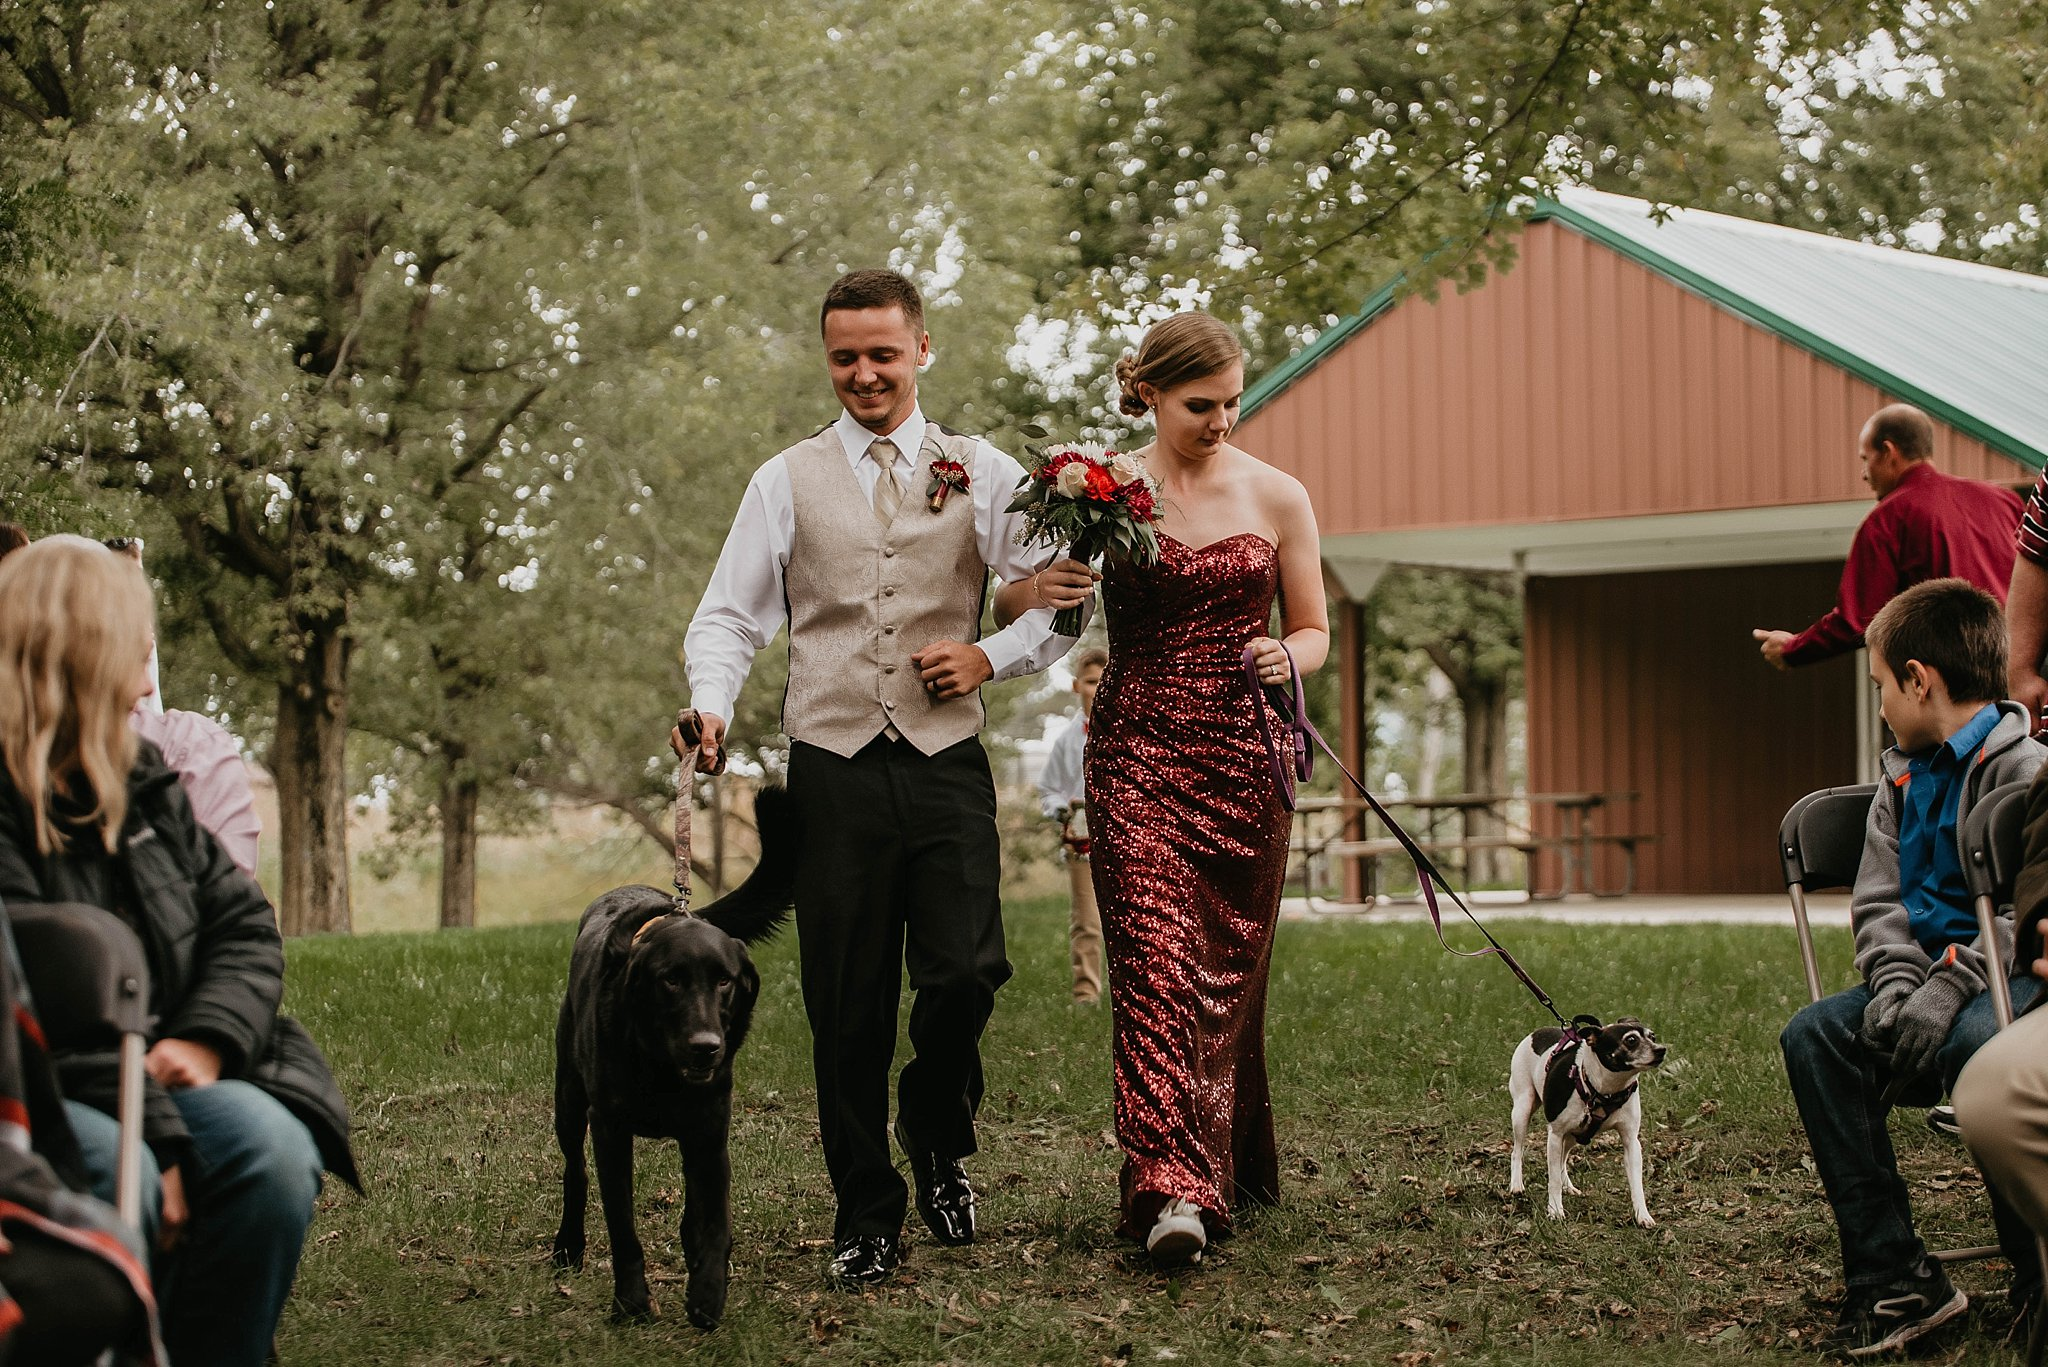 DesMoines-Iowa-Wedding-Photography-Destination-Photographer_0106.jpg